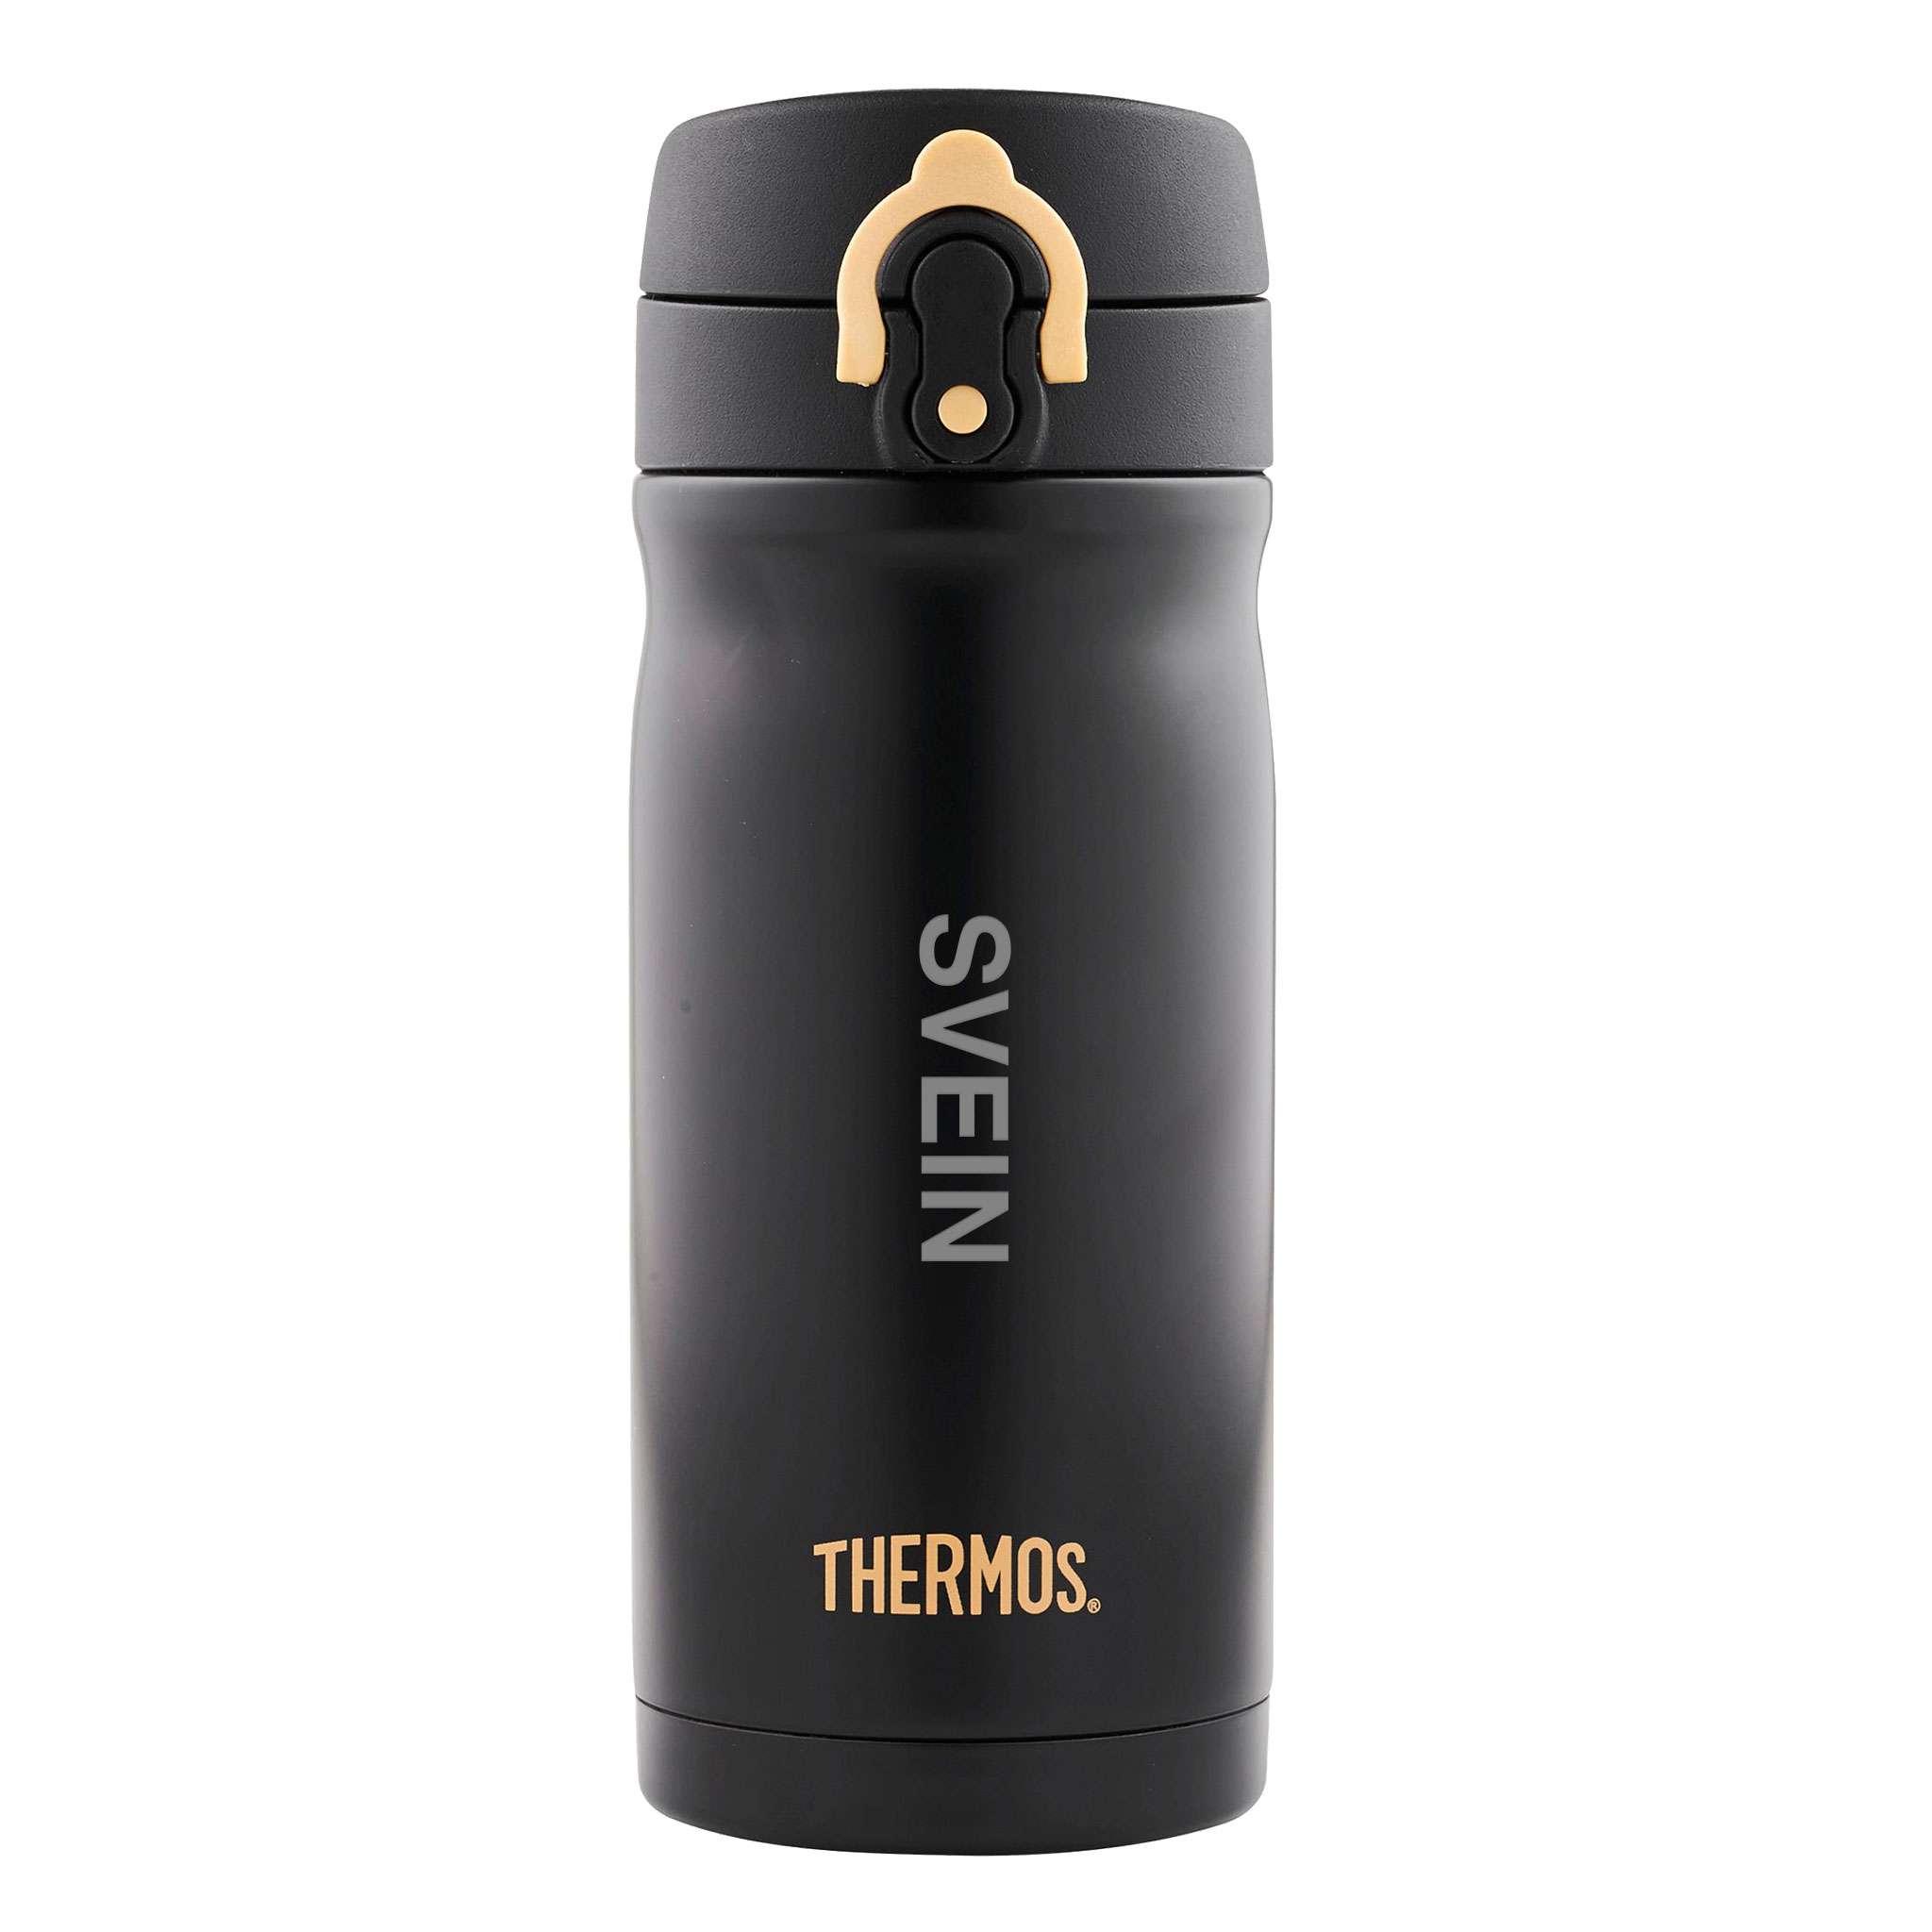 Thermos JMY Termosmuki 0,35 litraa, Musta